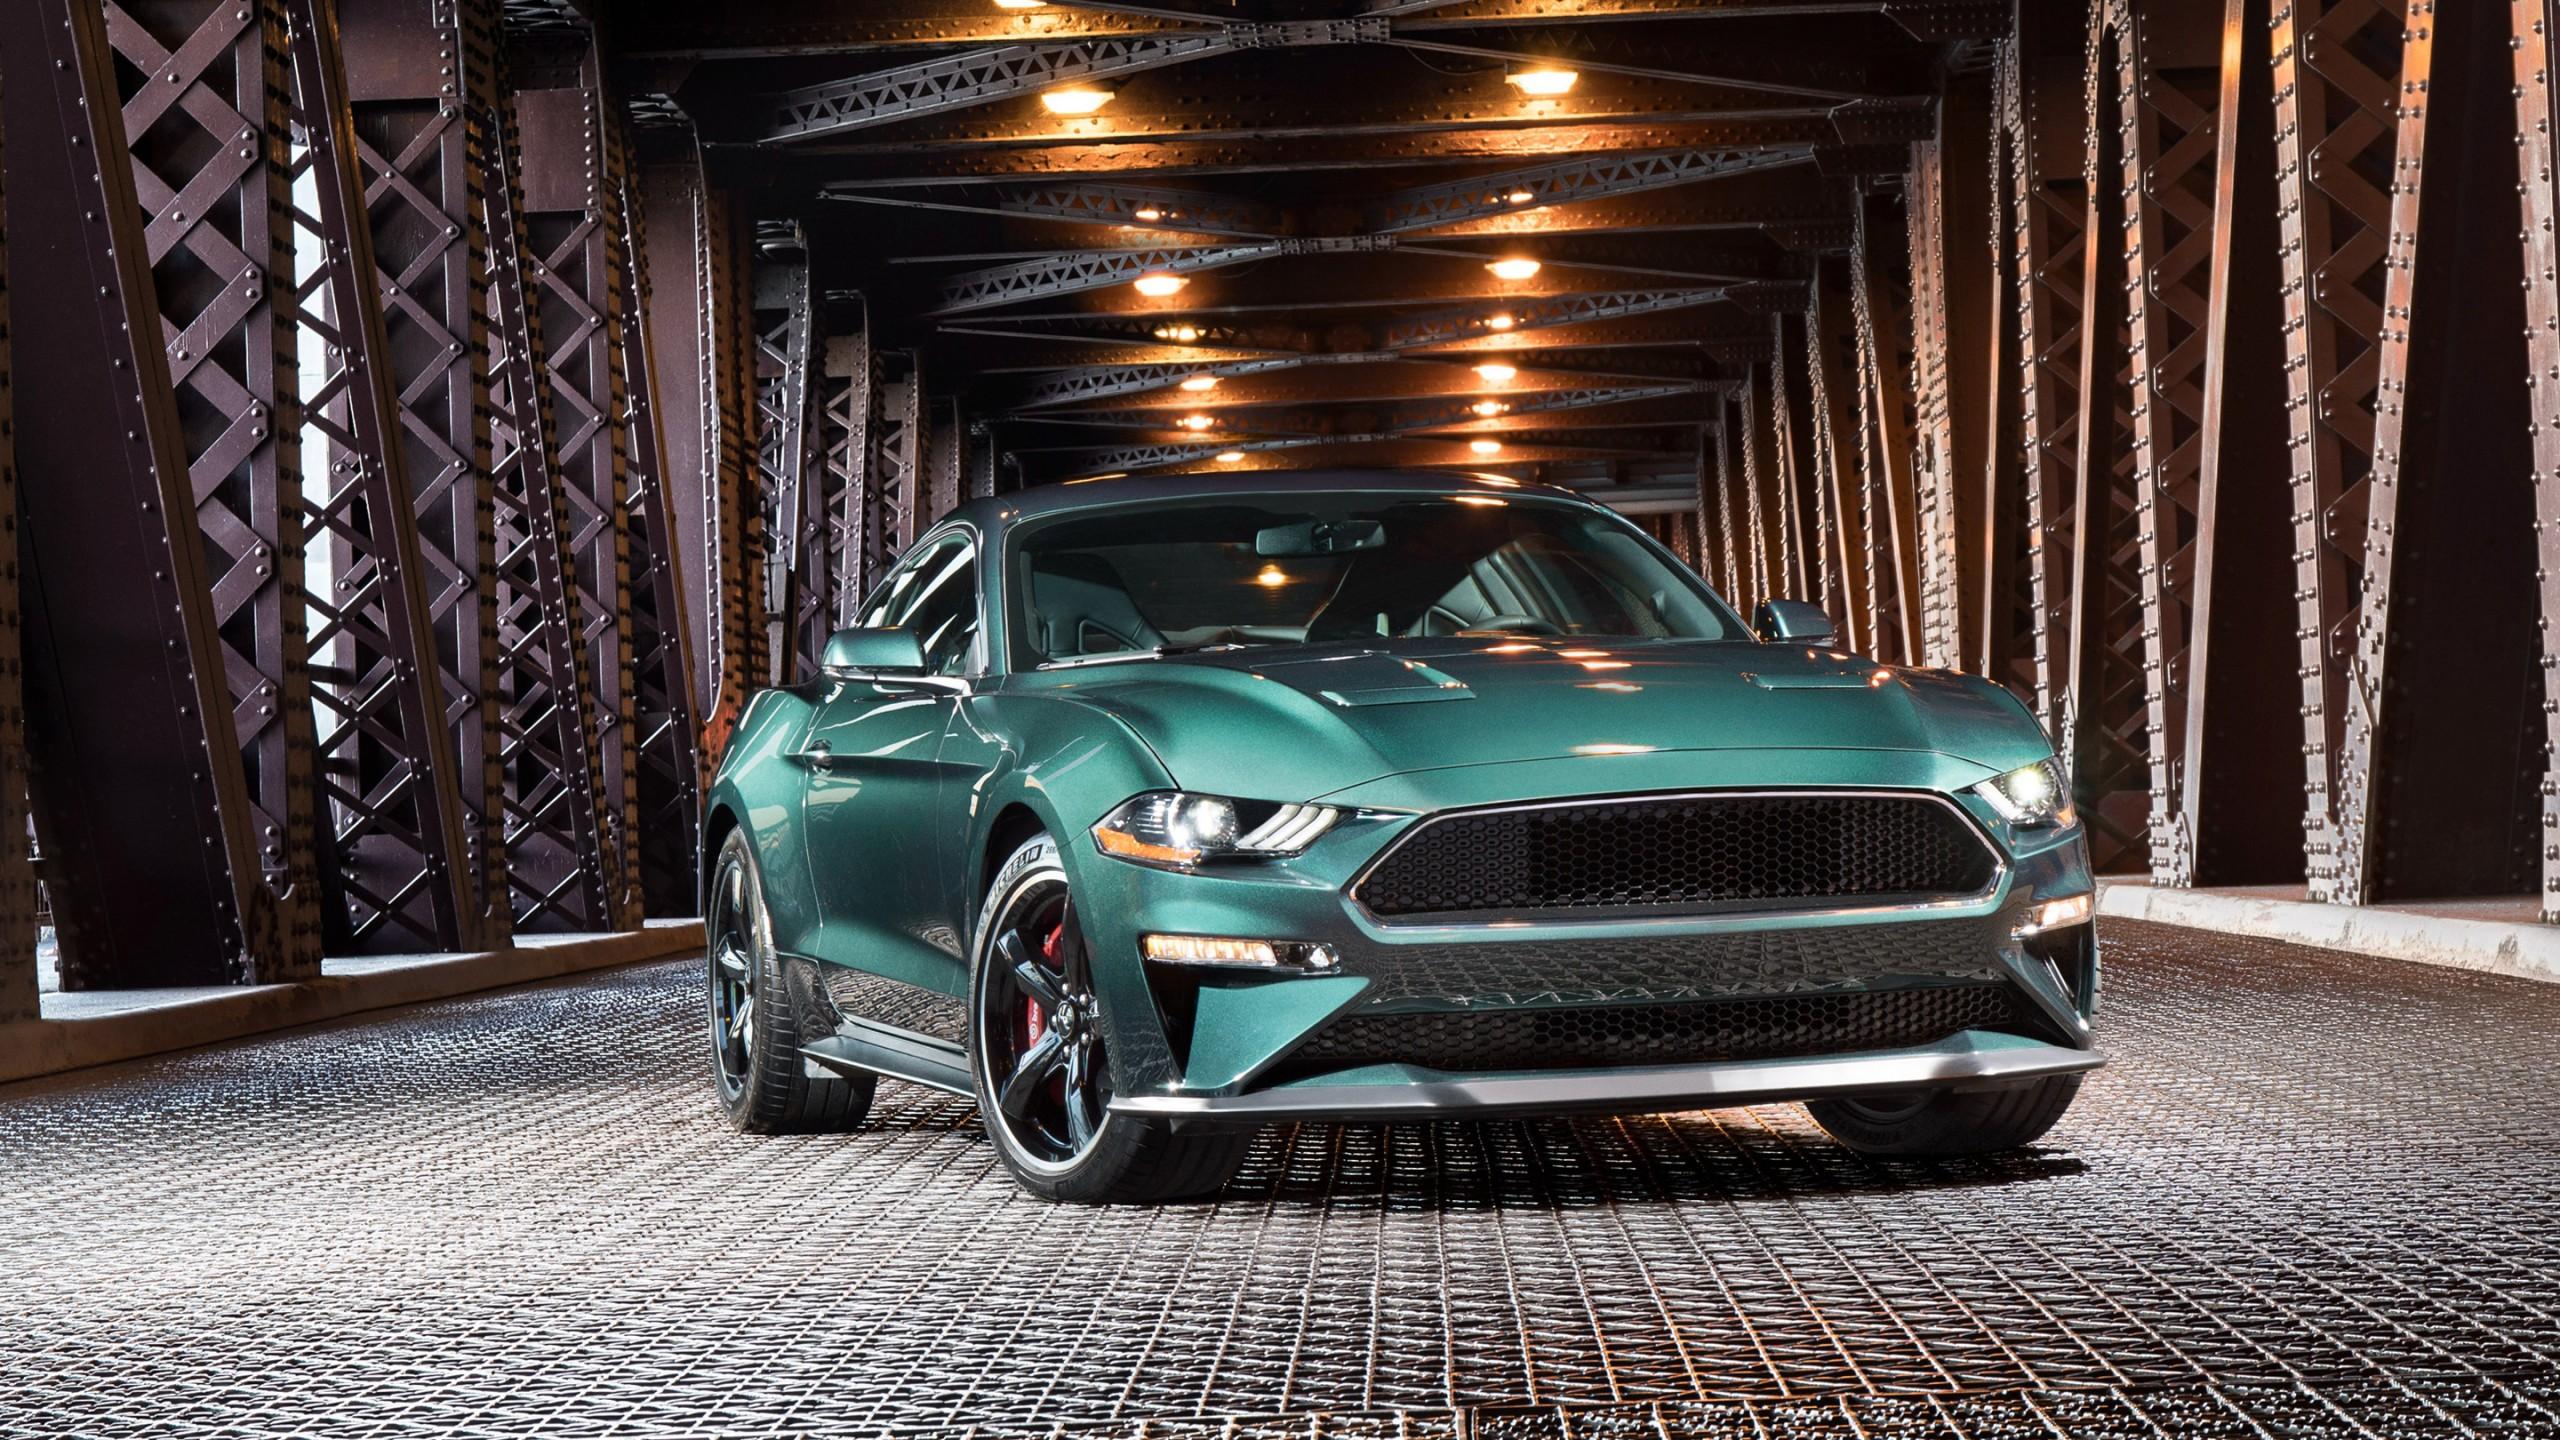 2019 Ford Mustang Bullitt Wallpaper Hd Car Wallpapers